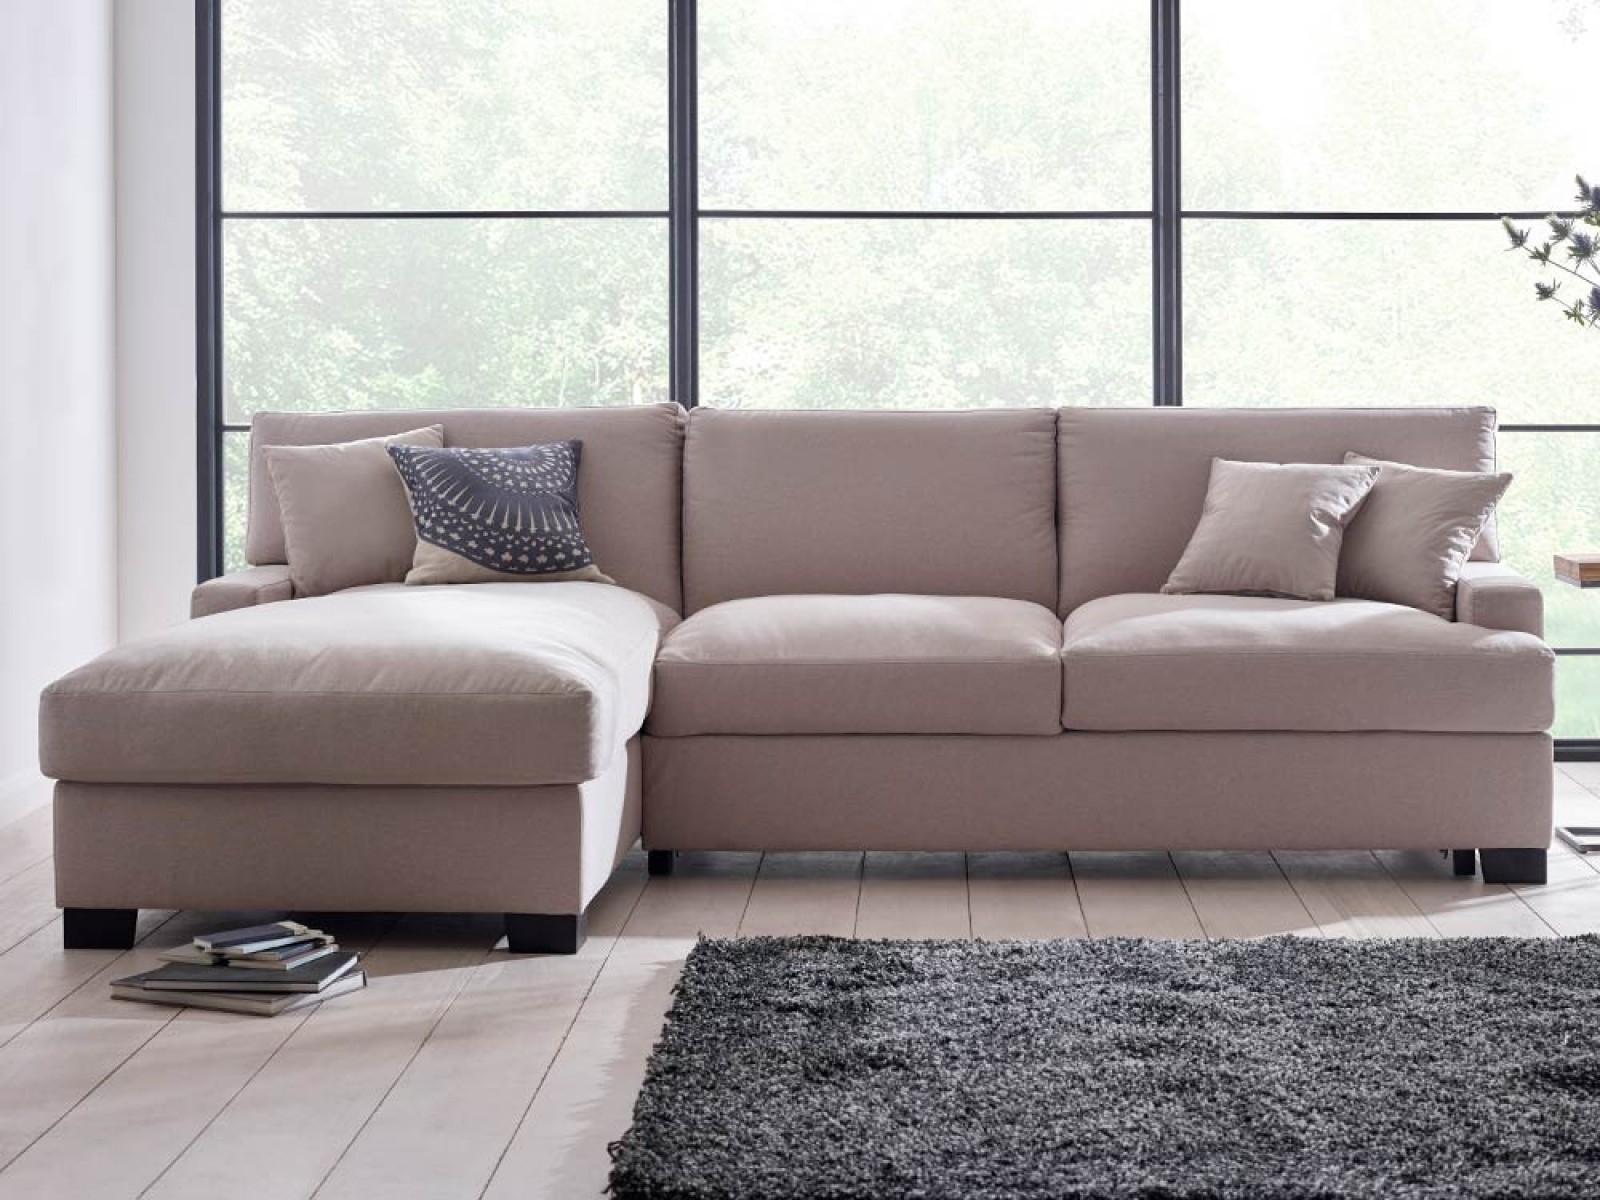 Most Recent Sofa : Jysk Corner Sofa Bed Corner Sofa Bed Green Corner Sofa Bed For Jysk Sectional Sofas (View 8 of 15)